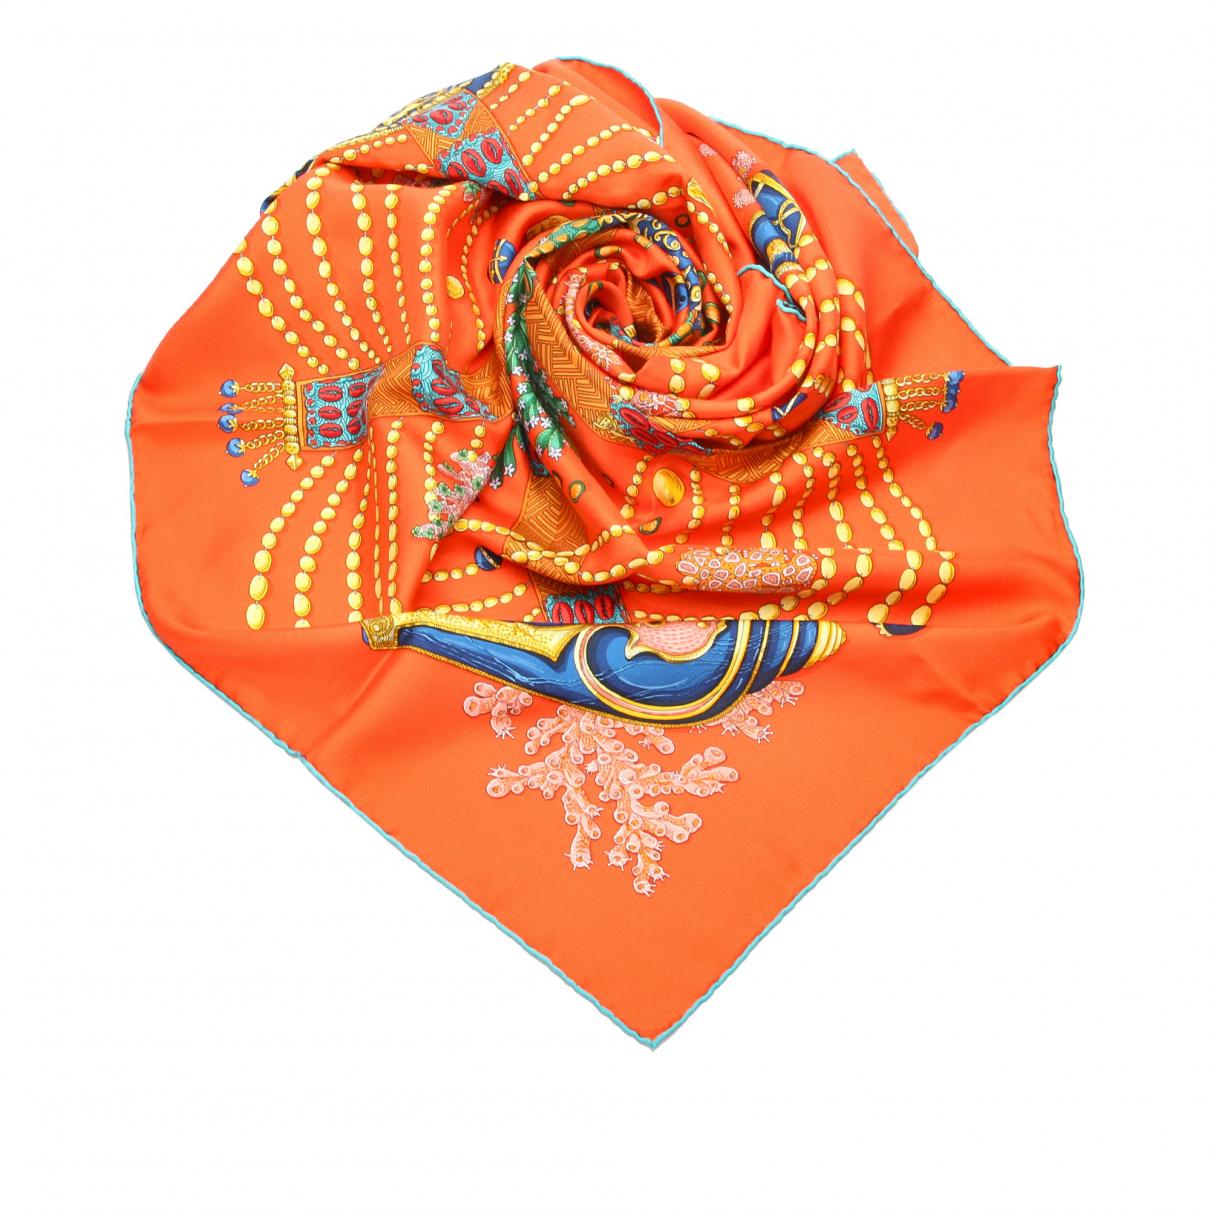 Hermès \N Orange scarf for Women \N